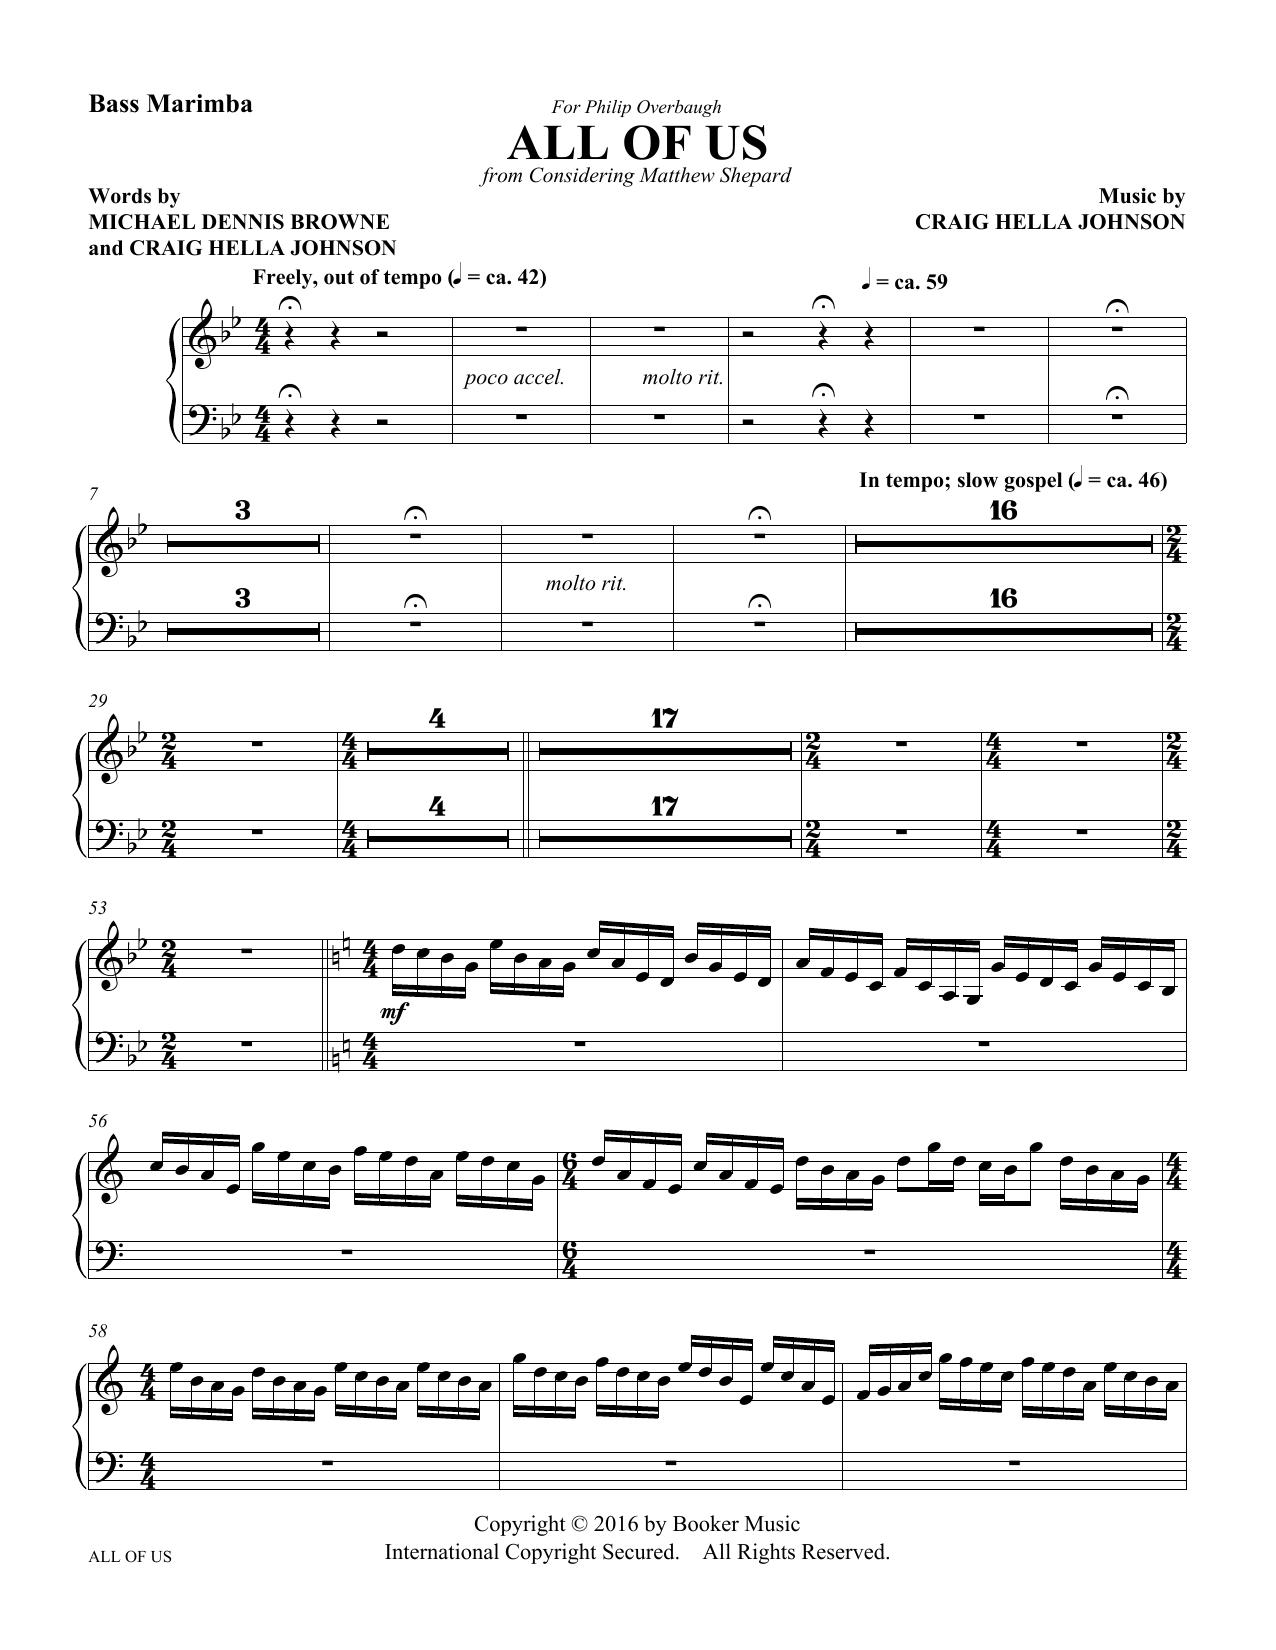 All of Us - Bass Marimba Sheet Music